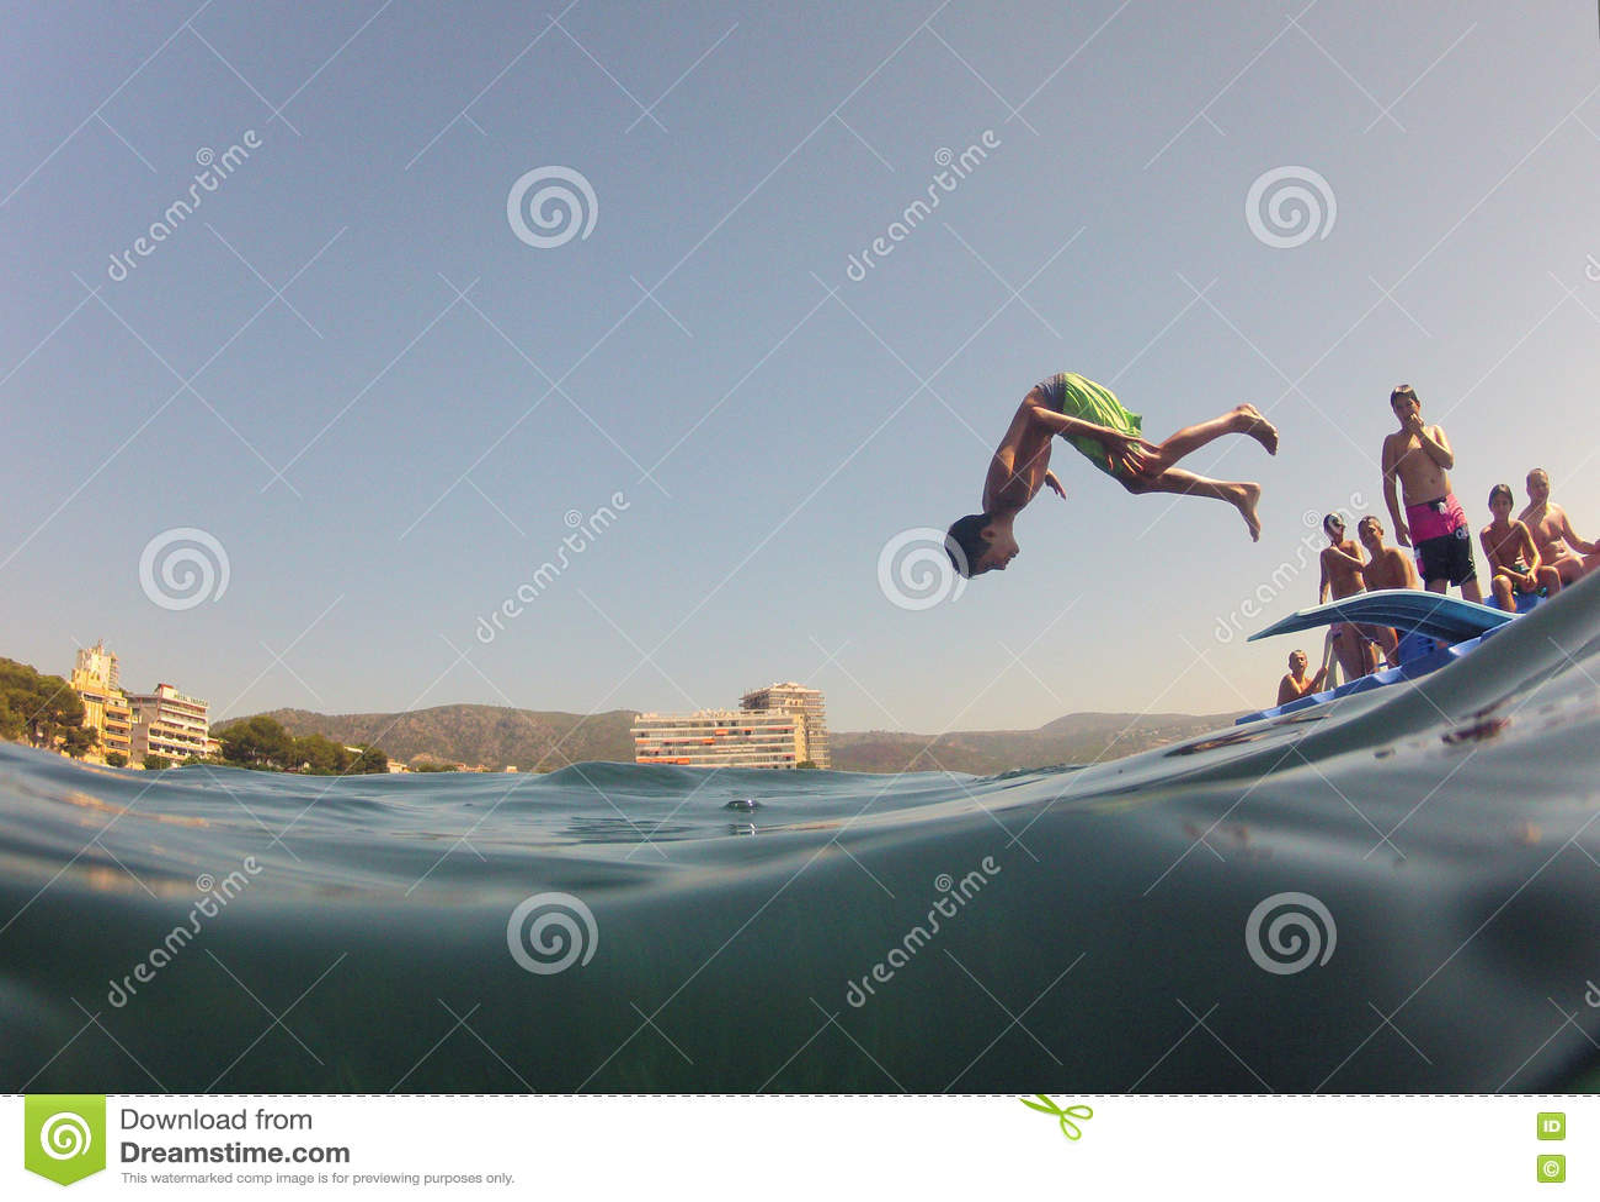 Summertime somersault